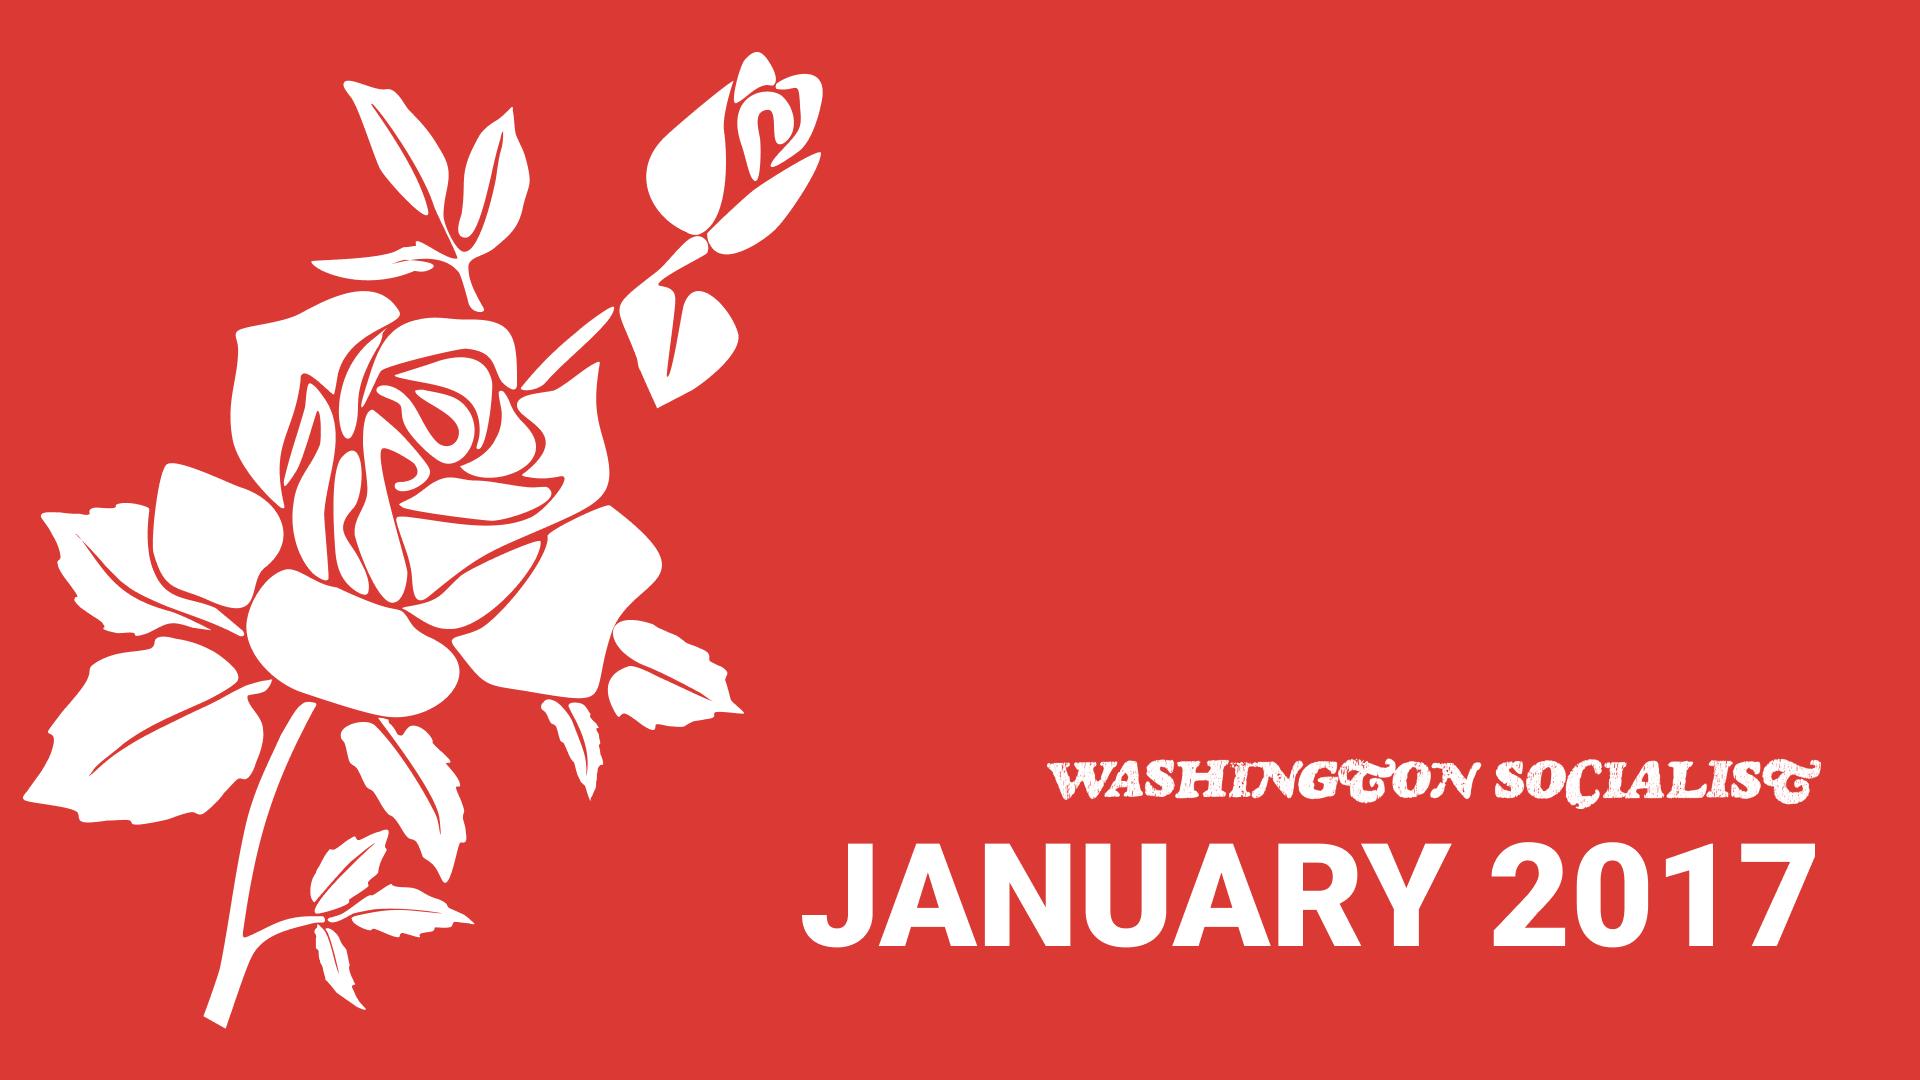 Washington Socialist Cover, January 2017